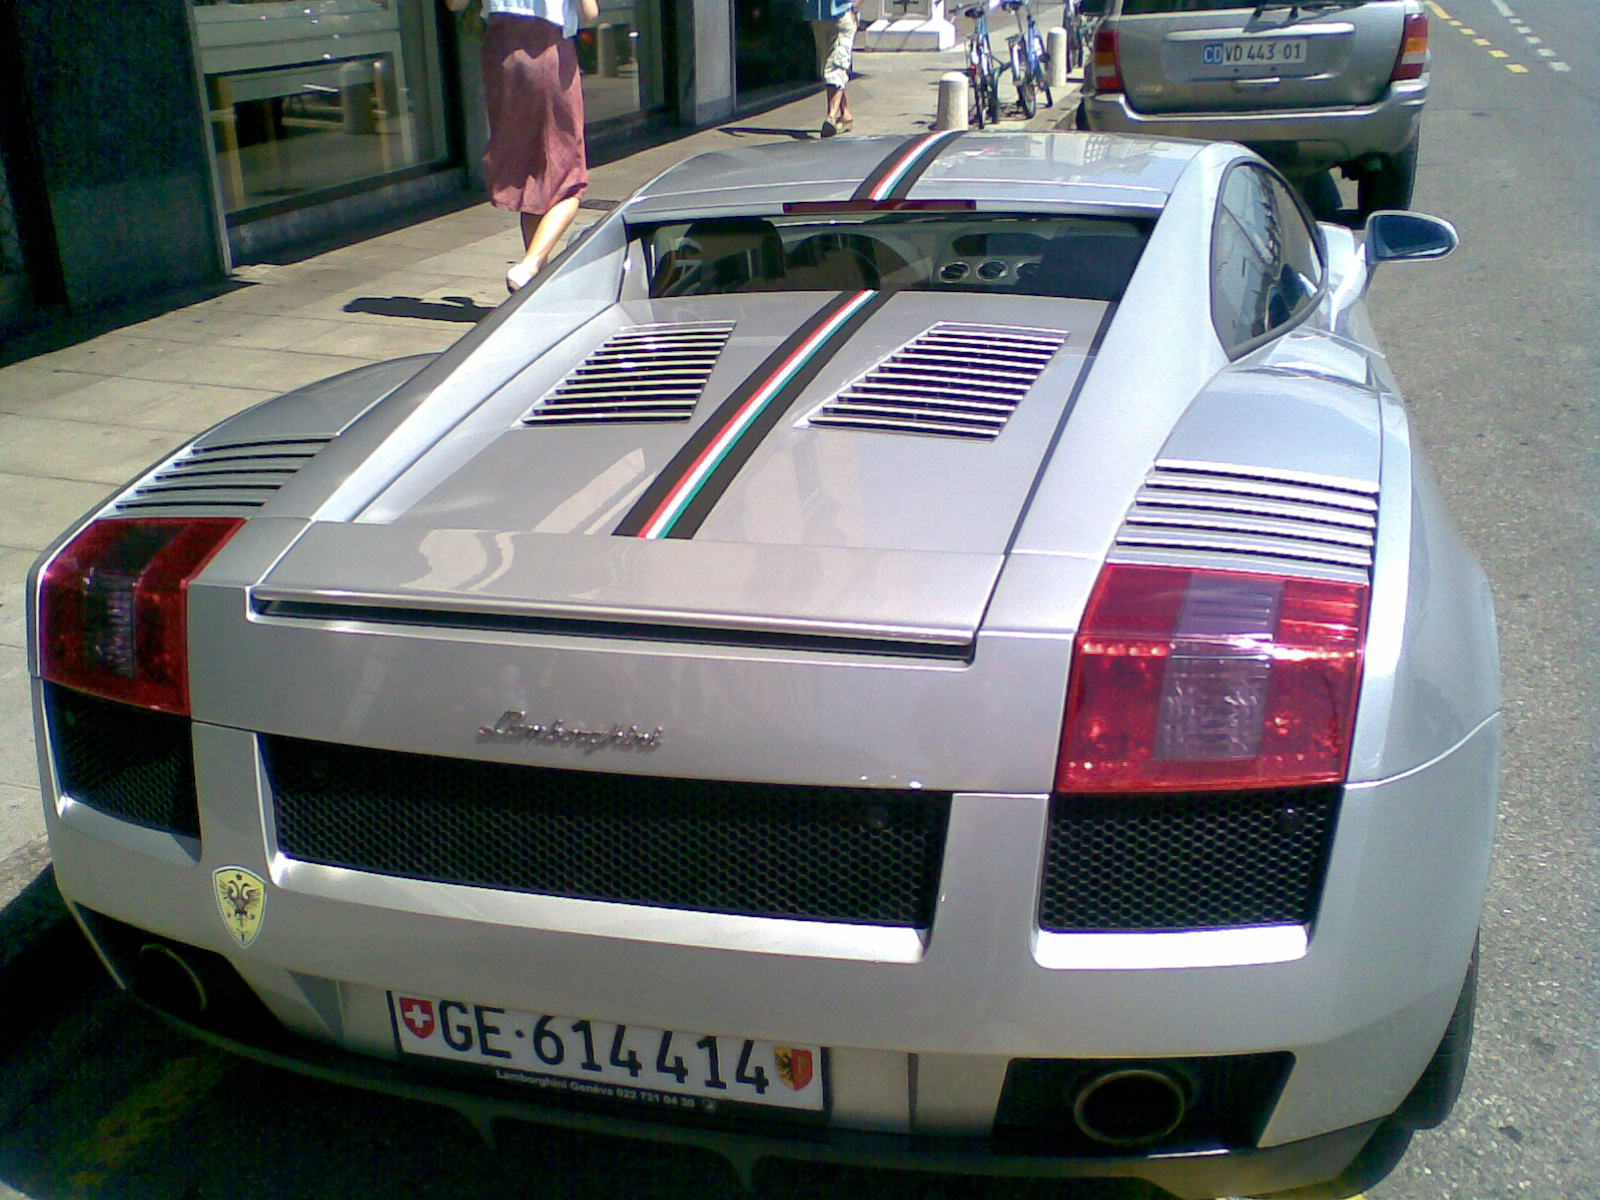 File Rear View Of Lamborghini Gallardo In Geneva Switzerland Jpg